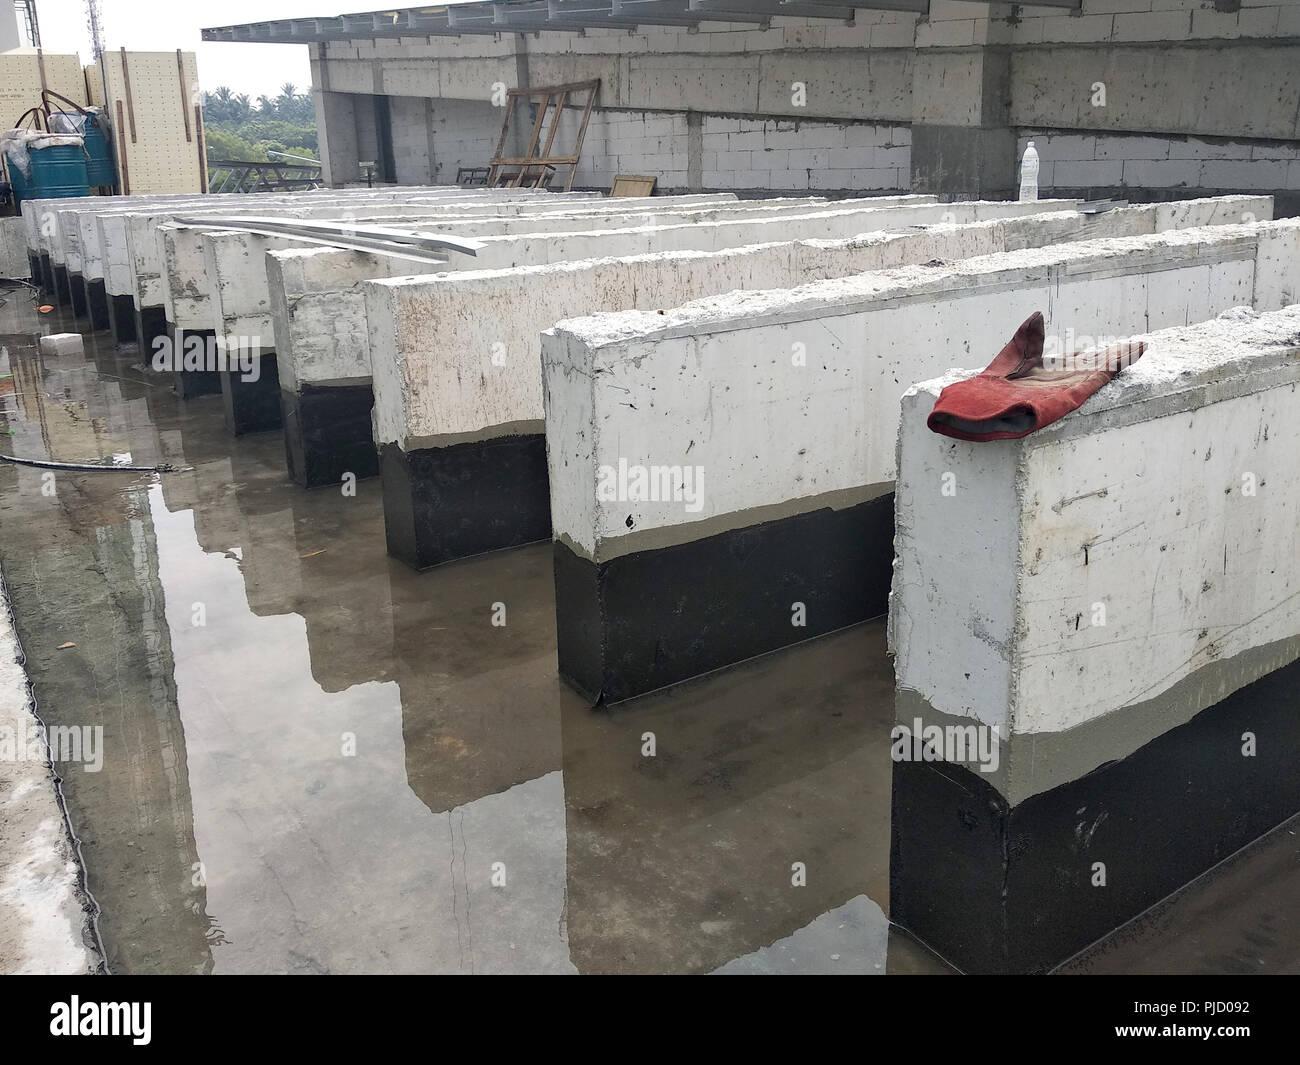 Waterproofing Stock Photos & Waterproofing Stock Images - Alamy